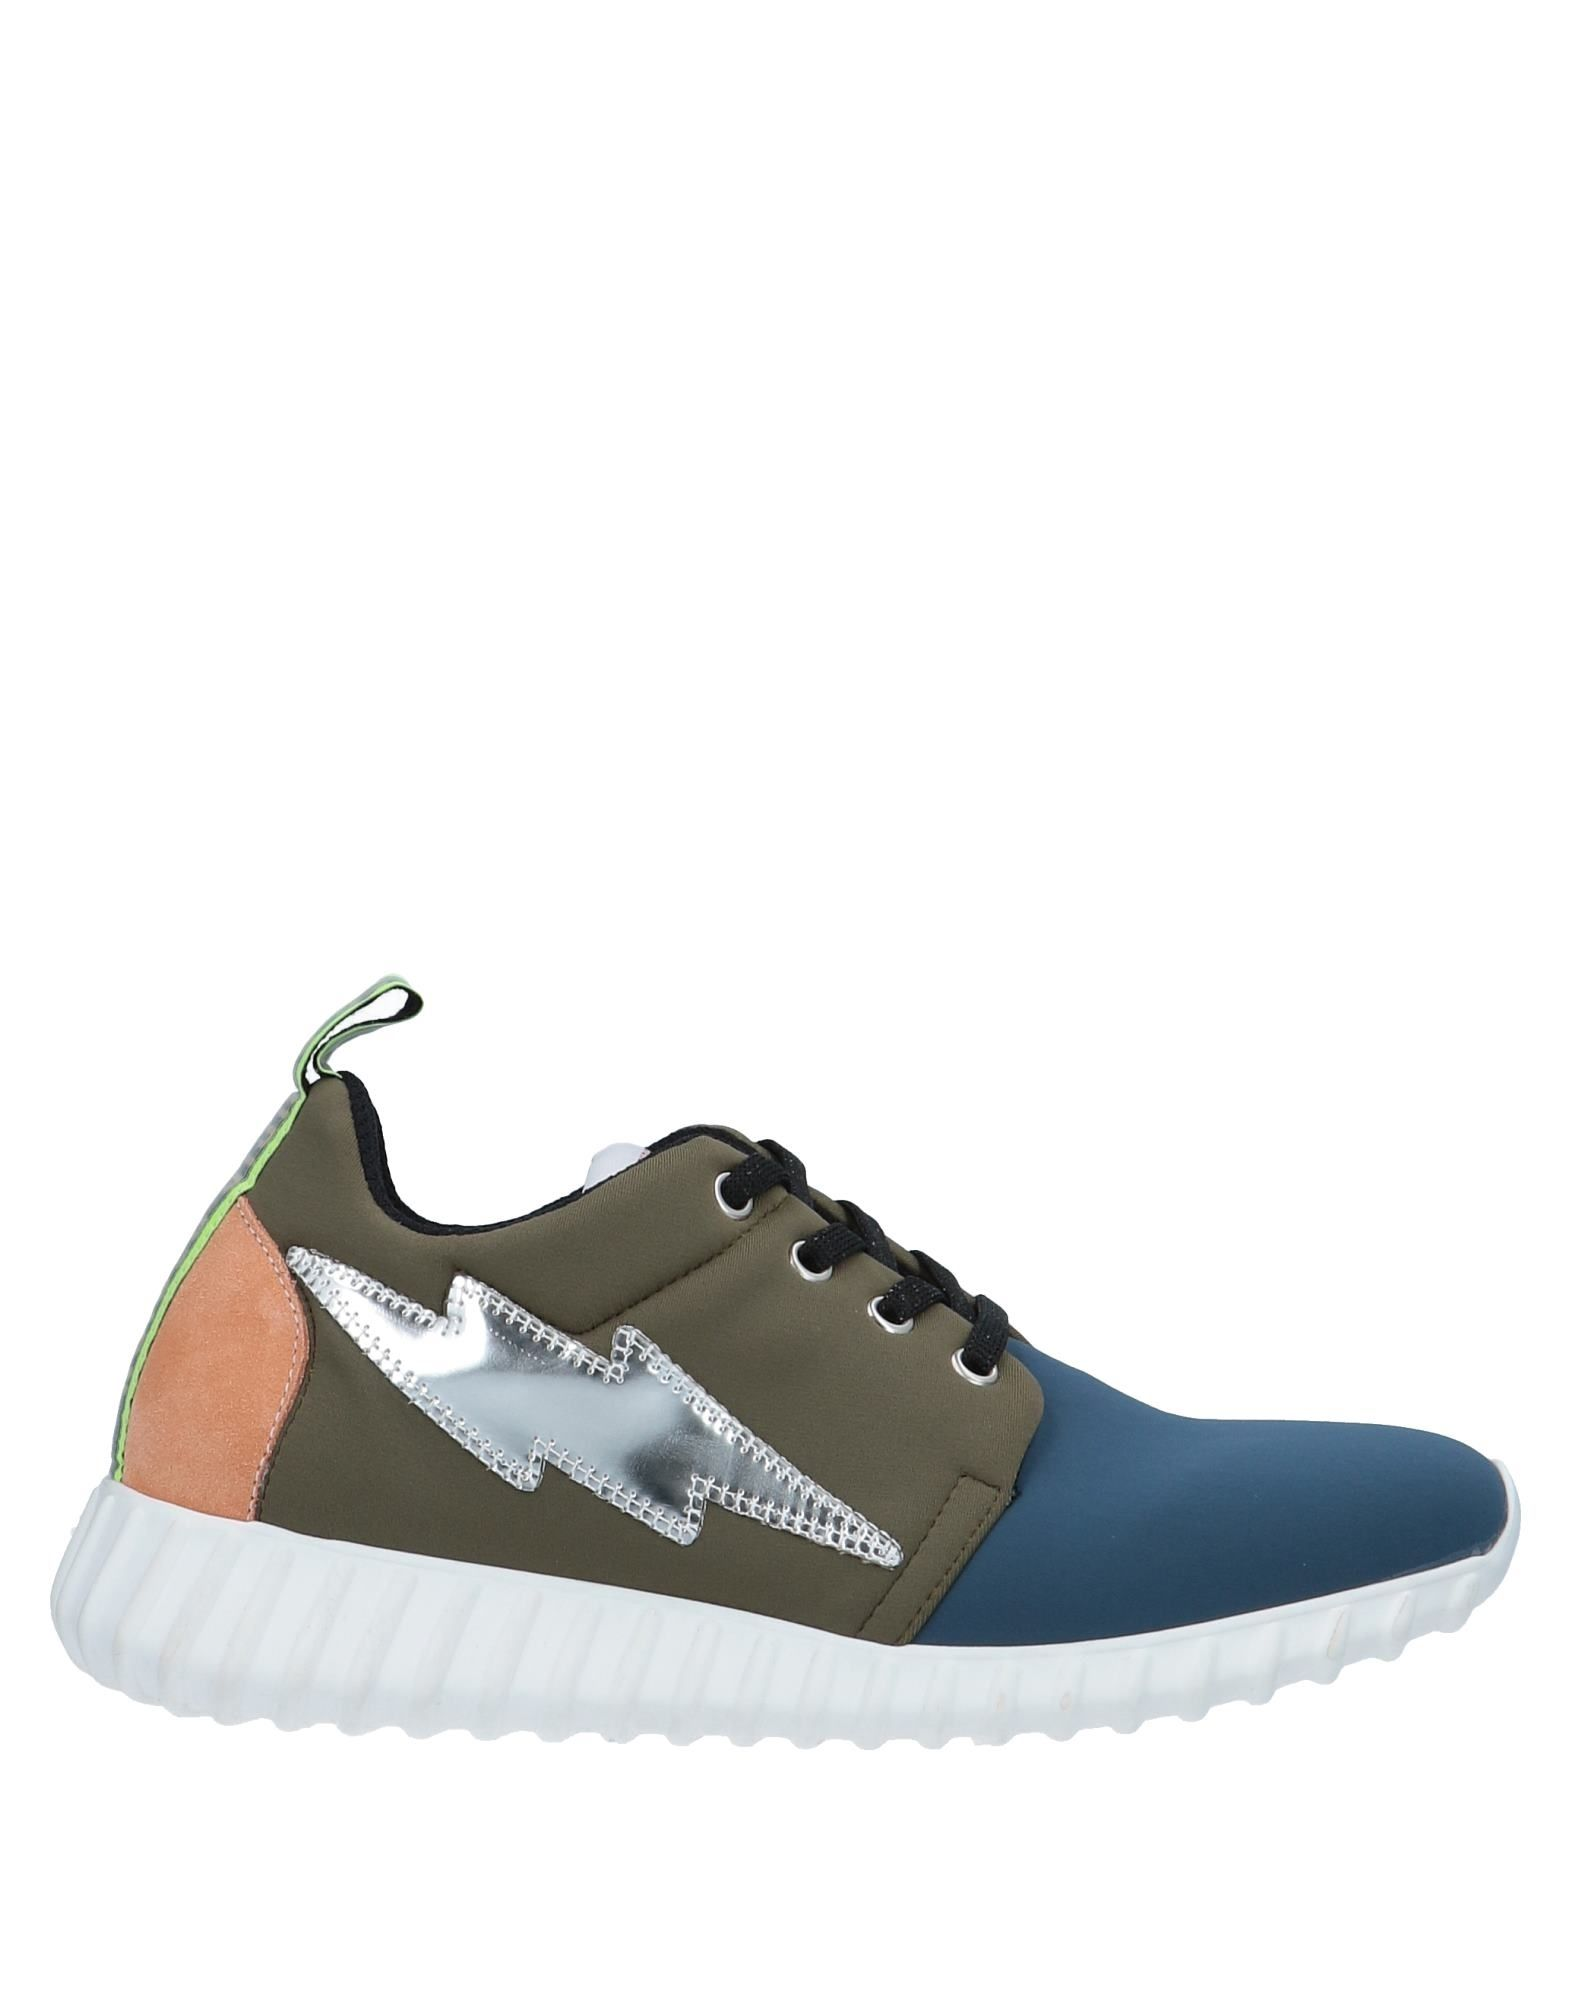 Leo Studio Design Sneakers Design - Women Leo Studio Design Sneakers Sneakers online on  Australia - 11560891XN b14e25